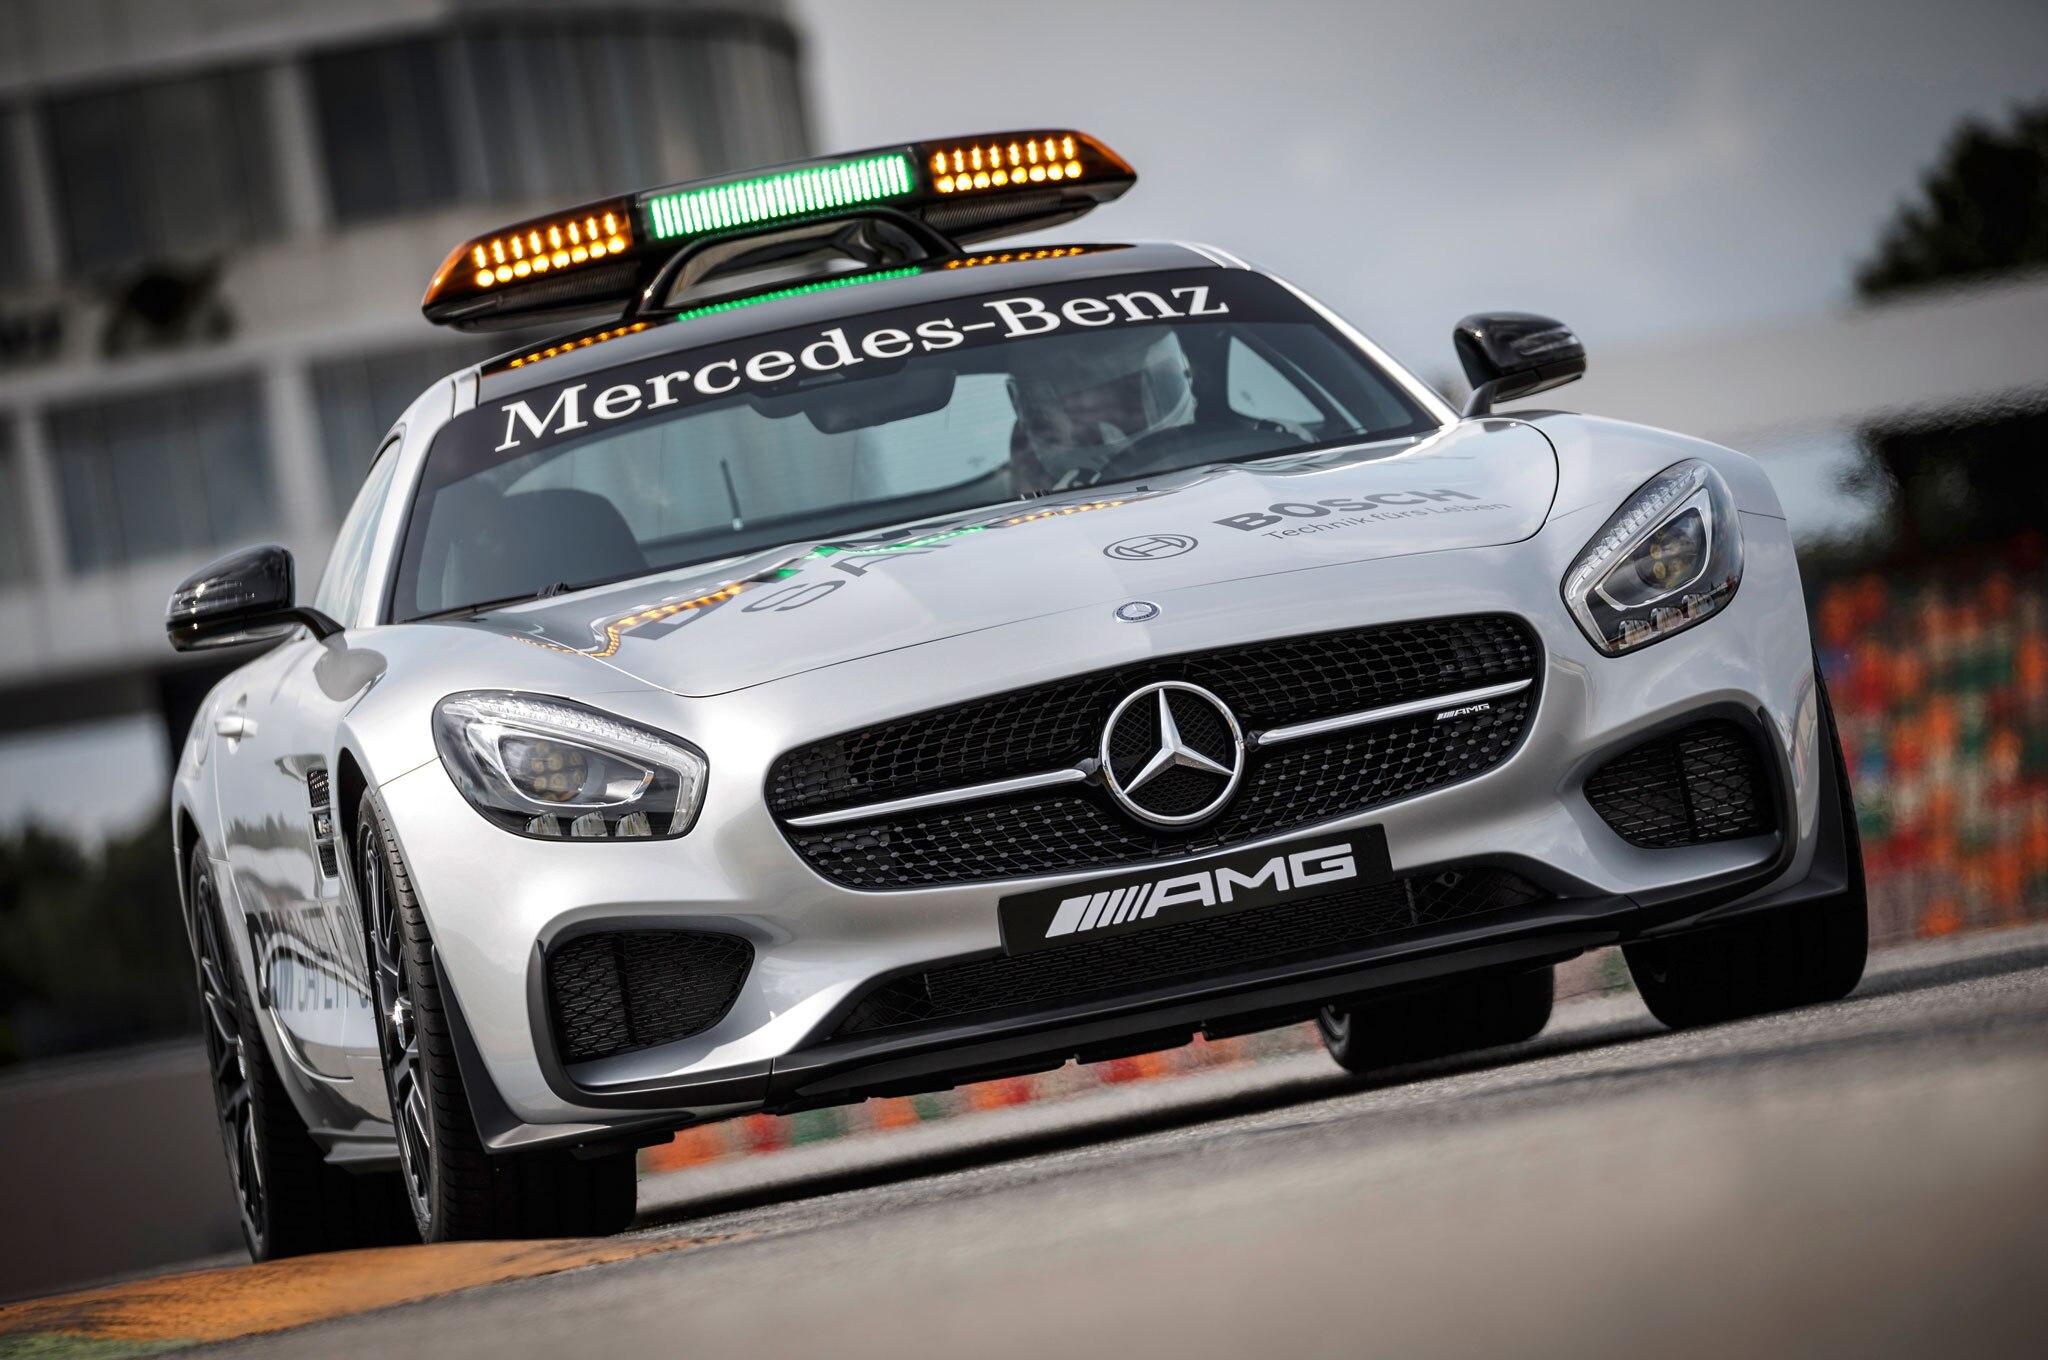 2016 mercedes-amg gt s transformed into dtm safety car